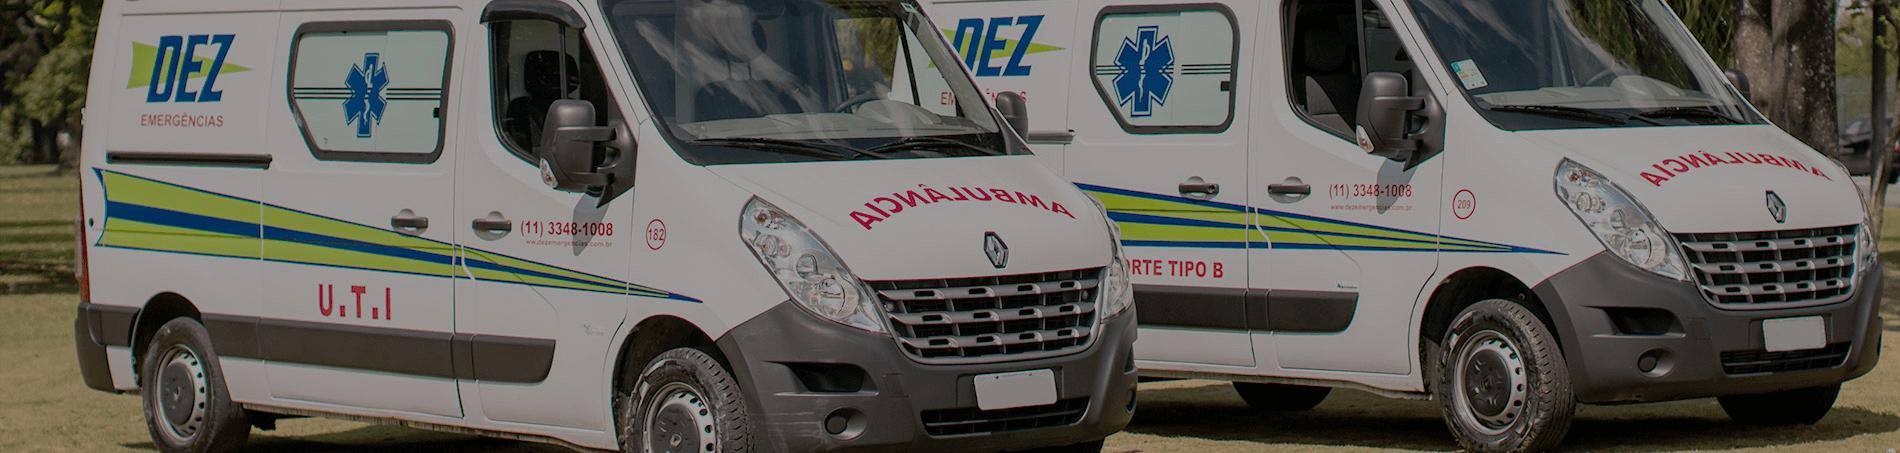 dez-emergencias